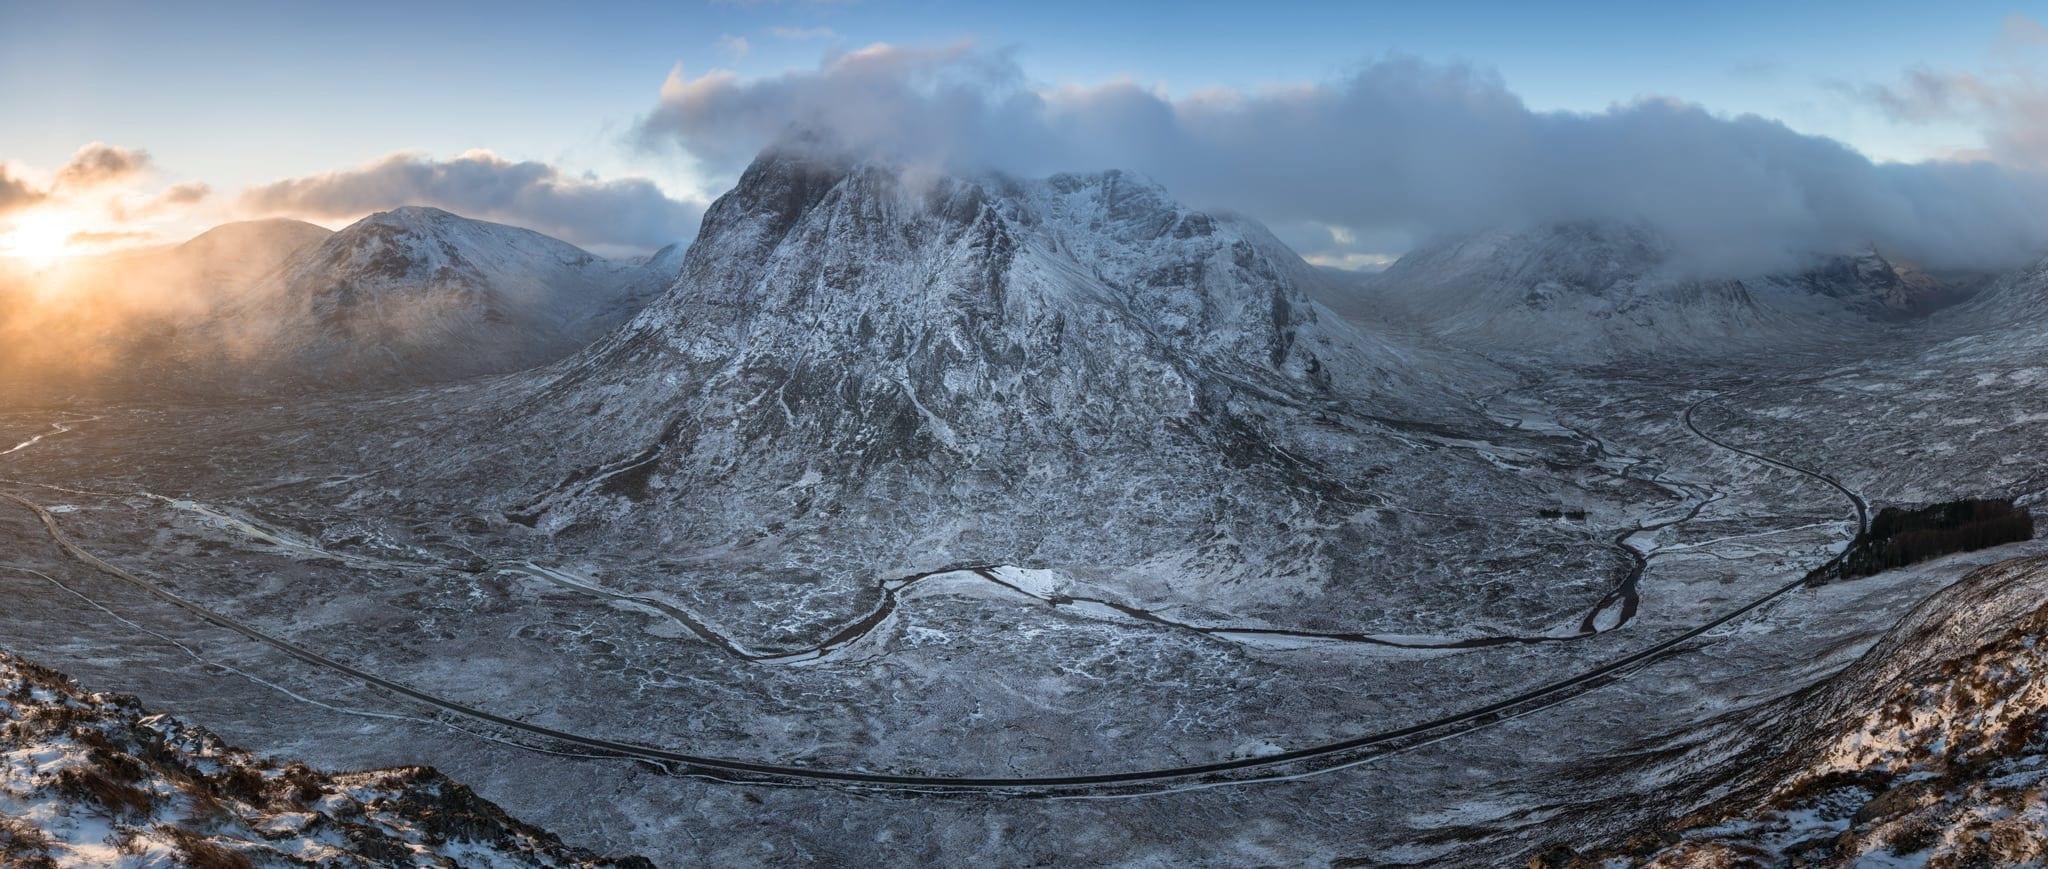 Beinn A' Chrulaiste Sunrise Panoramic - Scotland Landscape Photography